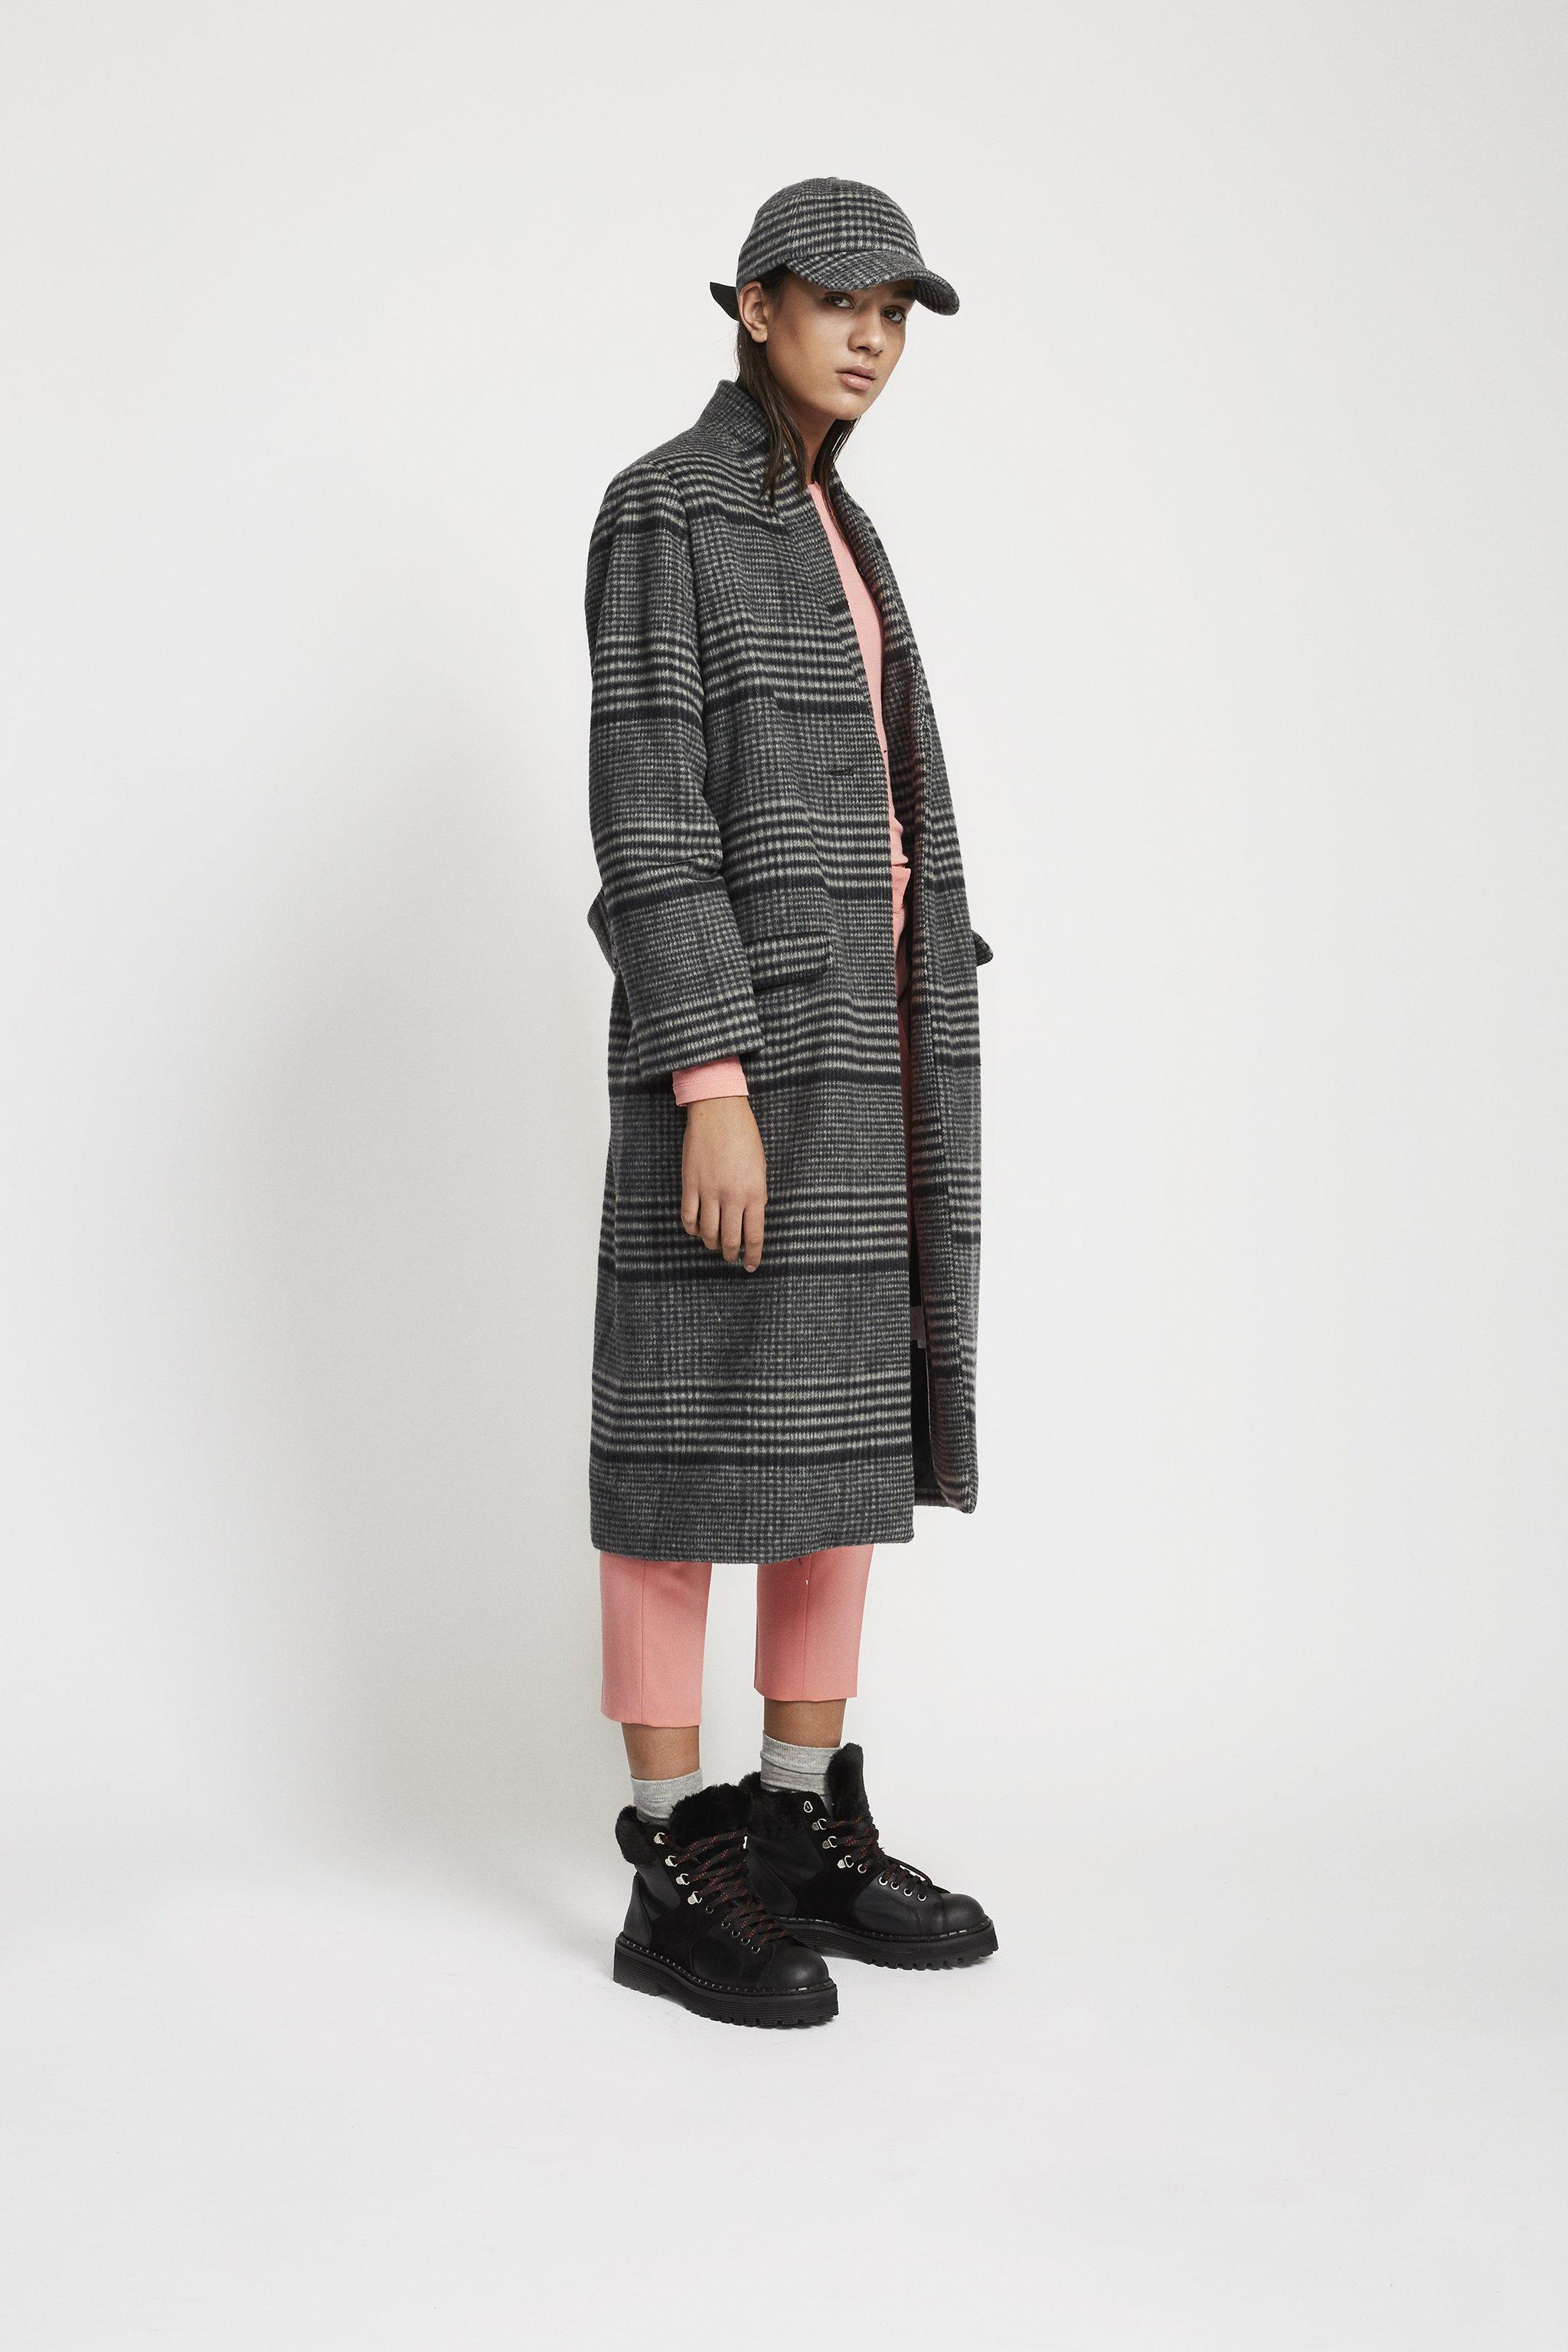 Estelle_Checked_Wool_Coat-Jacket-8294-14867-889_Black_White_check_2048x.jpg